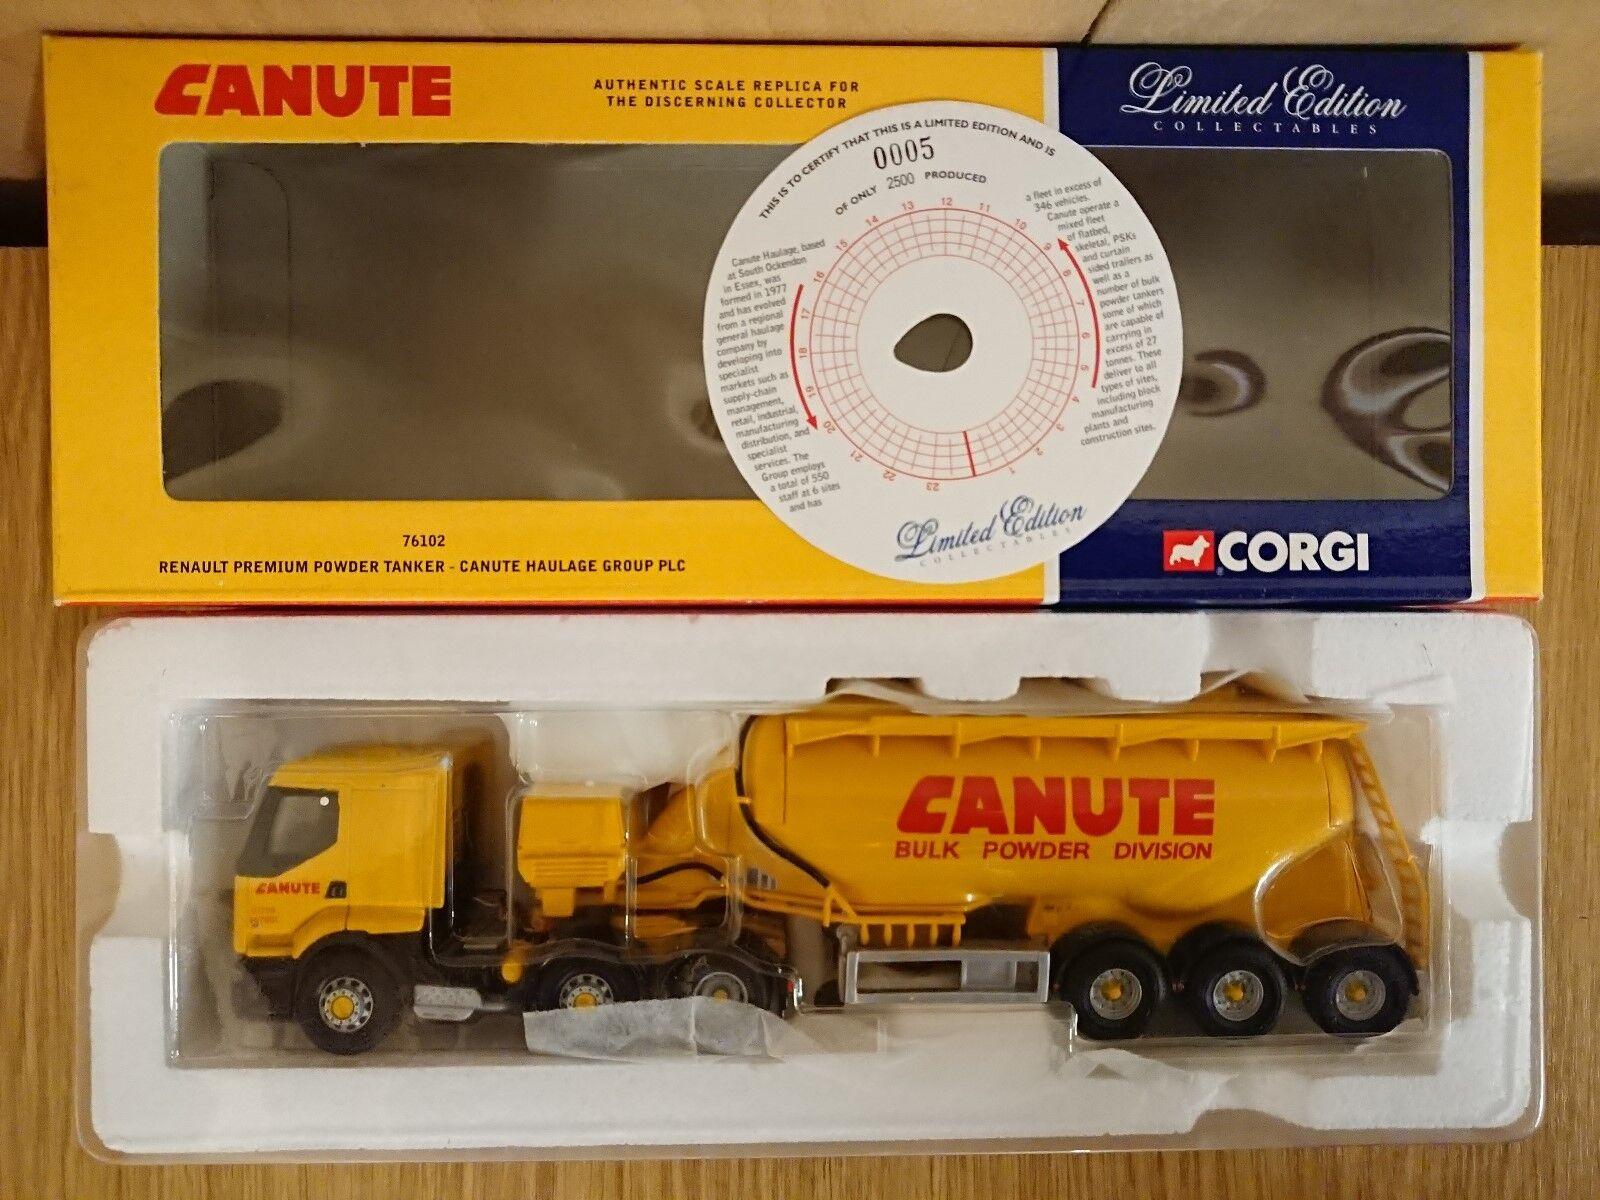 Corgi 76102 Renault Premium Powder Tanker Canute Haulage Ltd Ed nr. 0005 of 2500